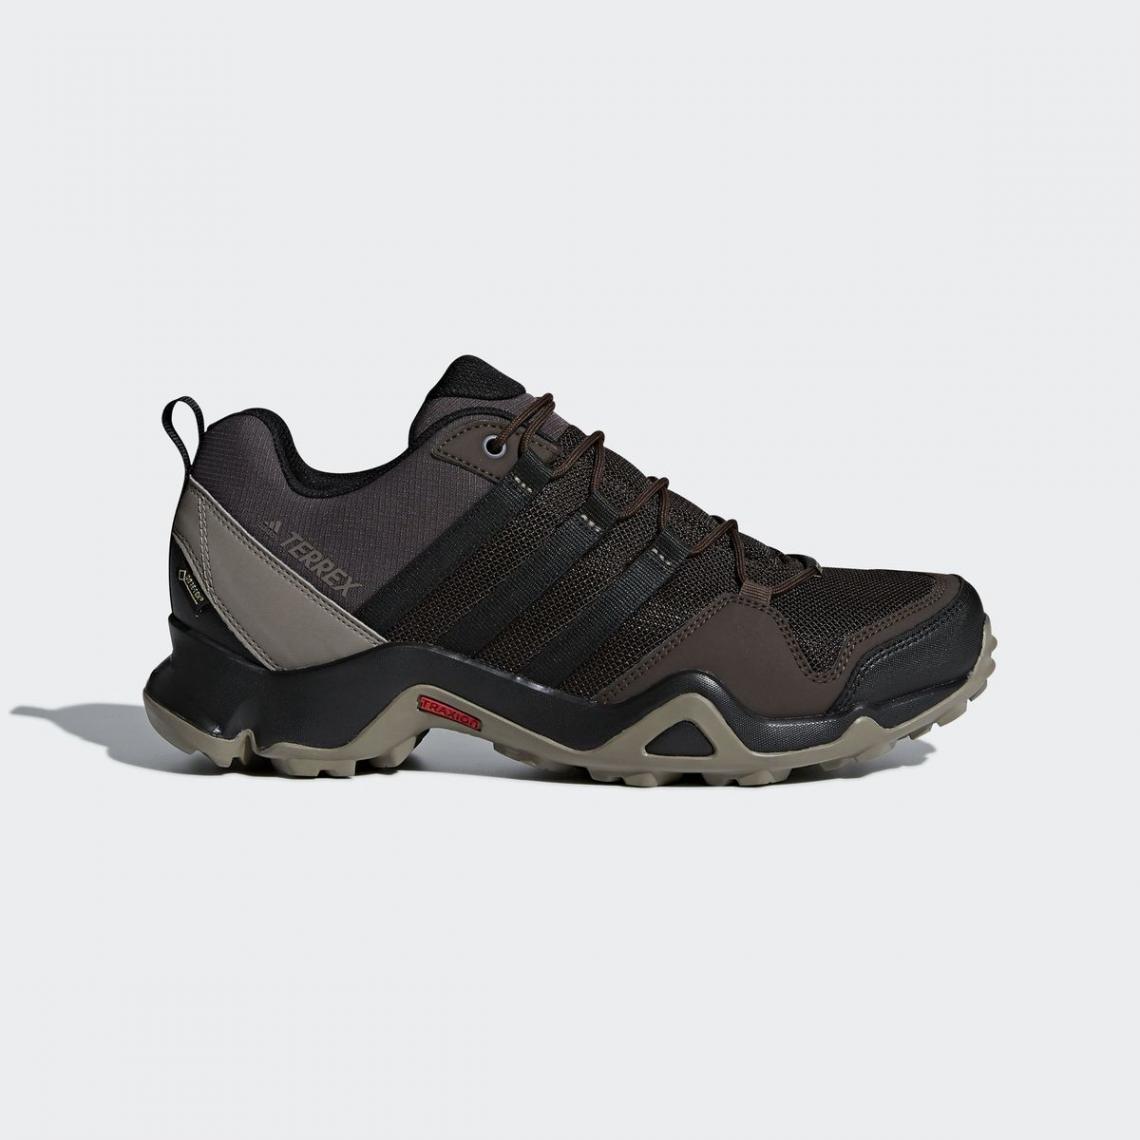 763650e17fa Prix de gros adidas chaussure marron France vente en ligne